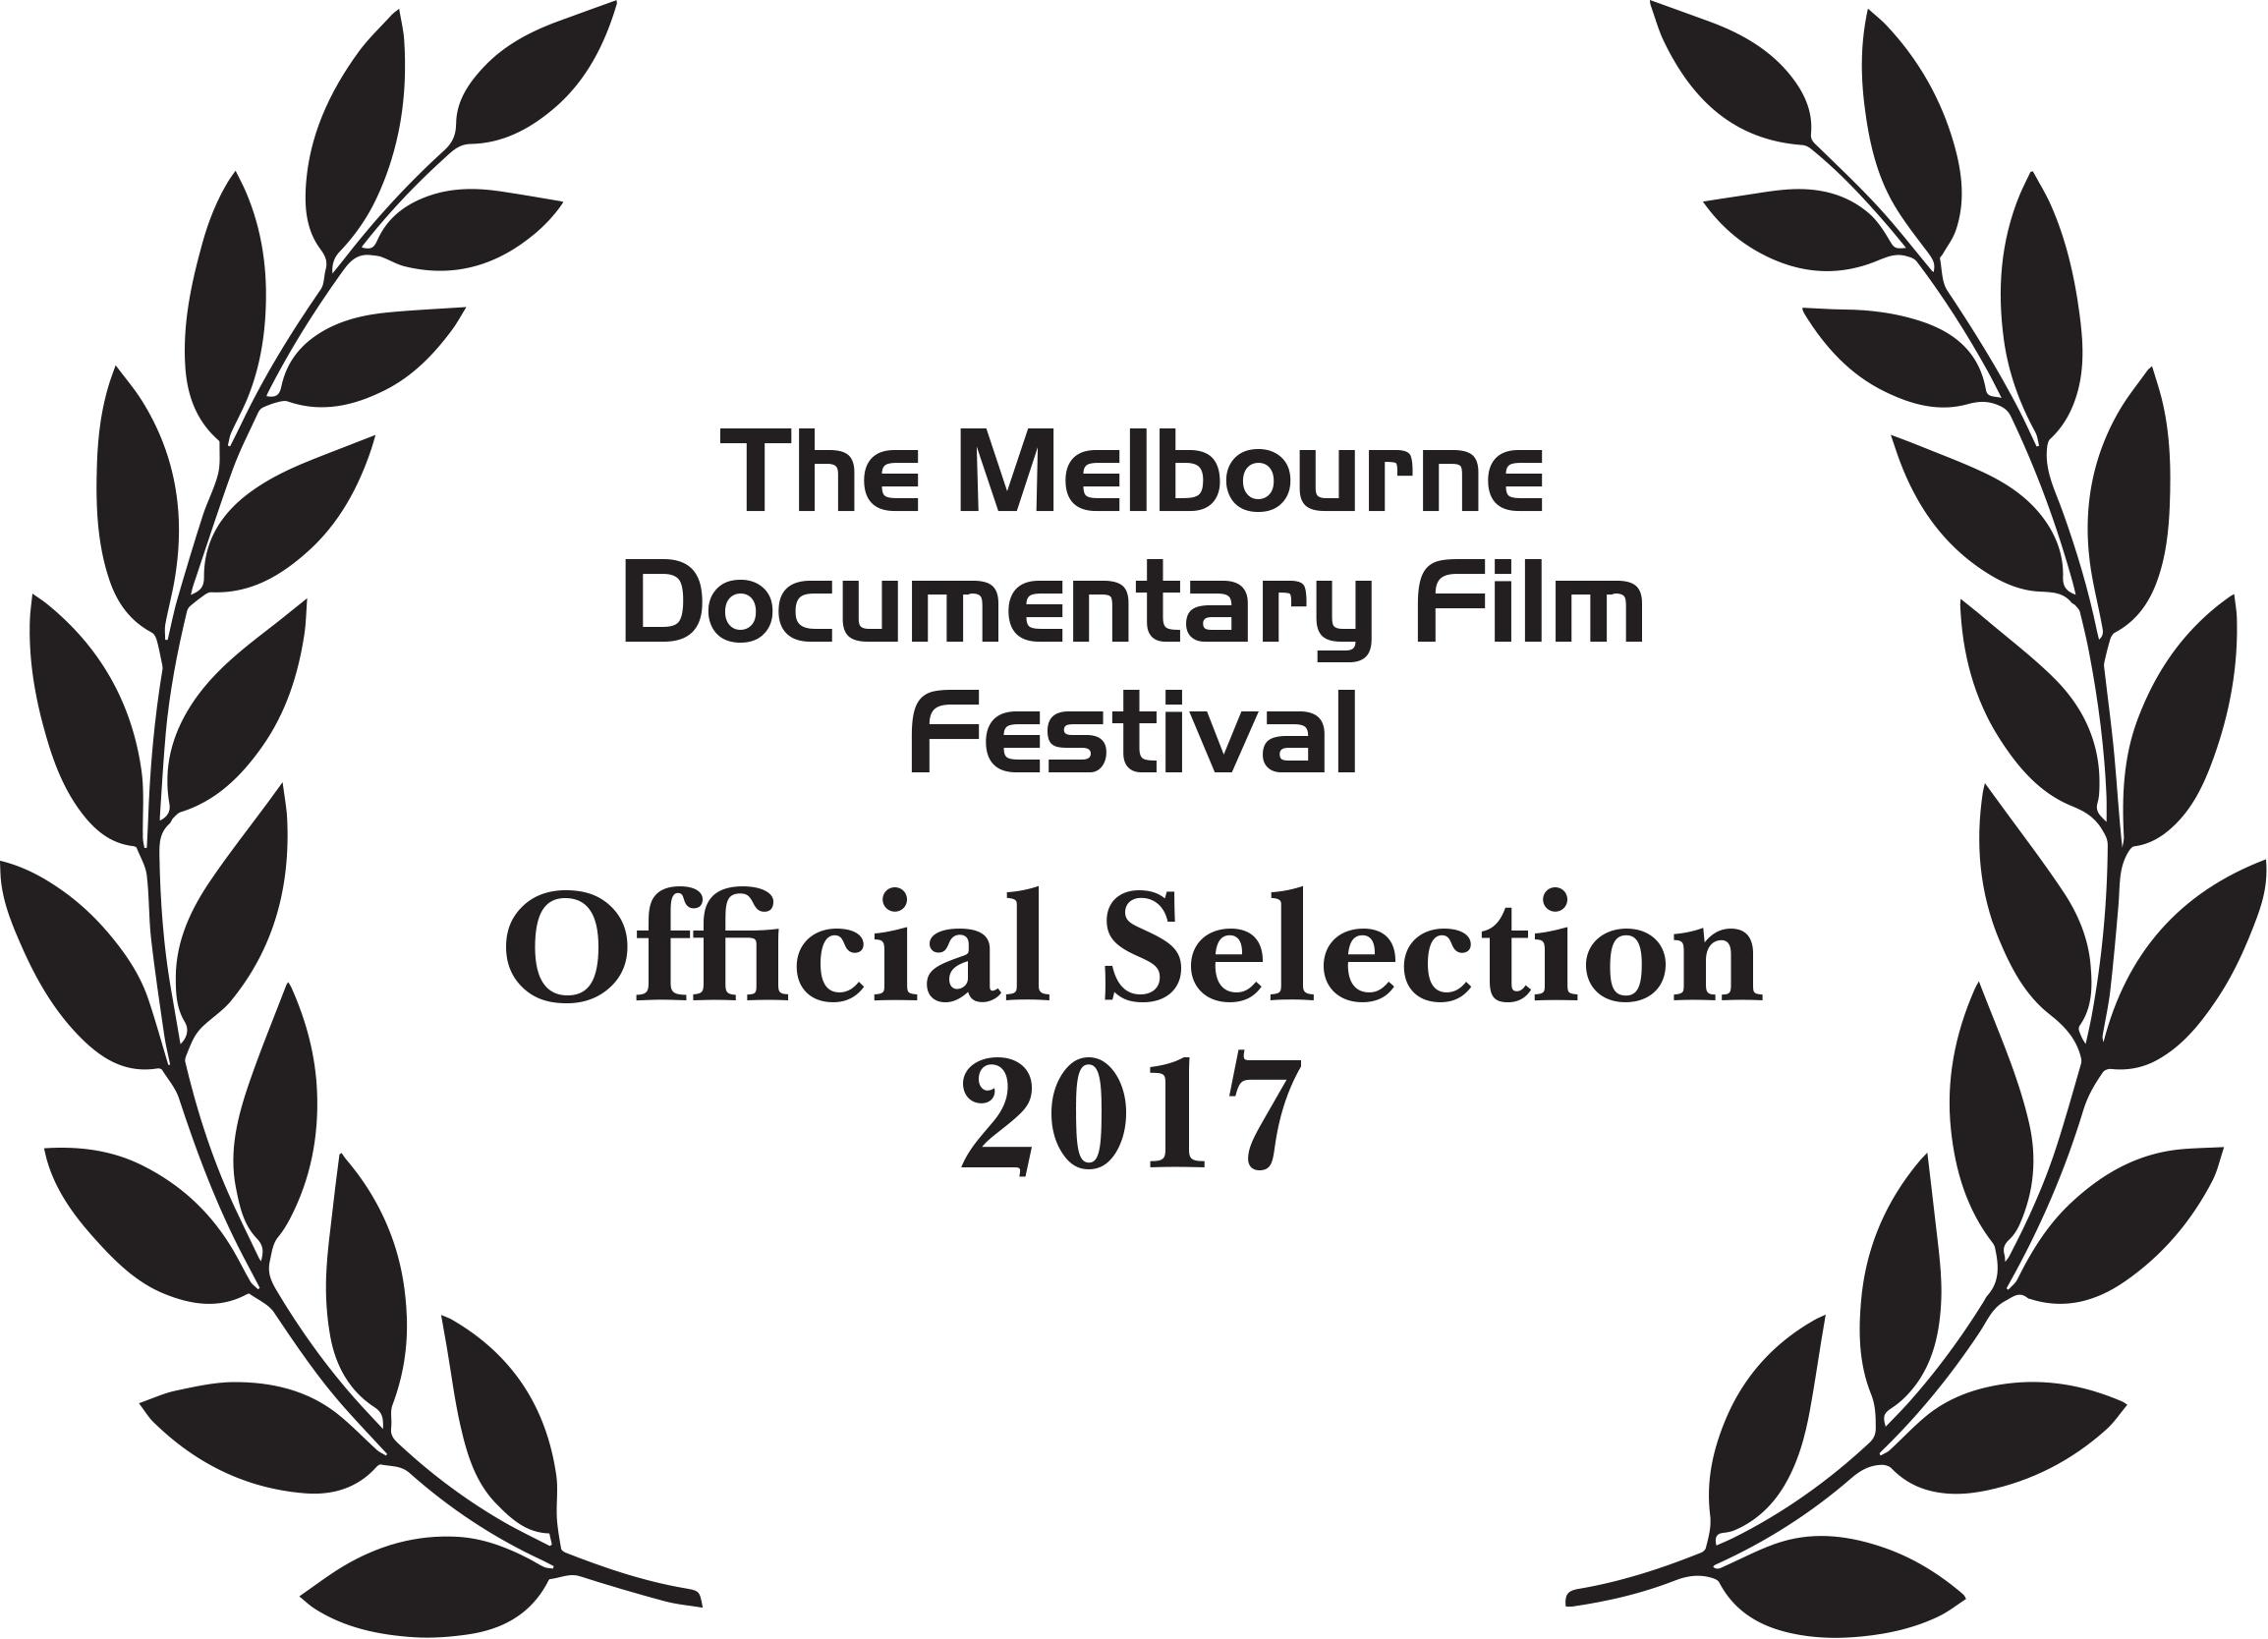 Official_Selection_2017_Laurel